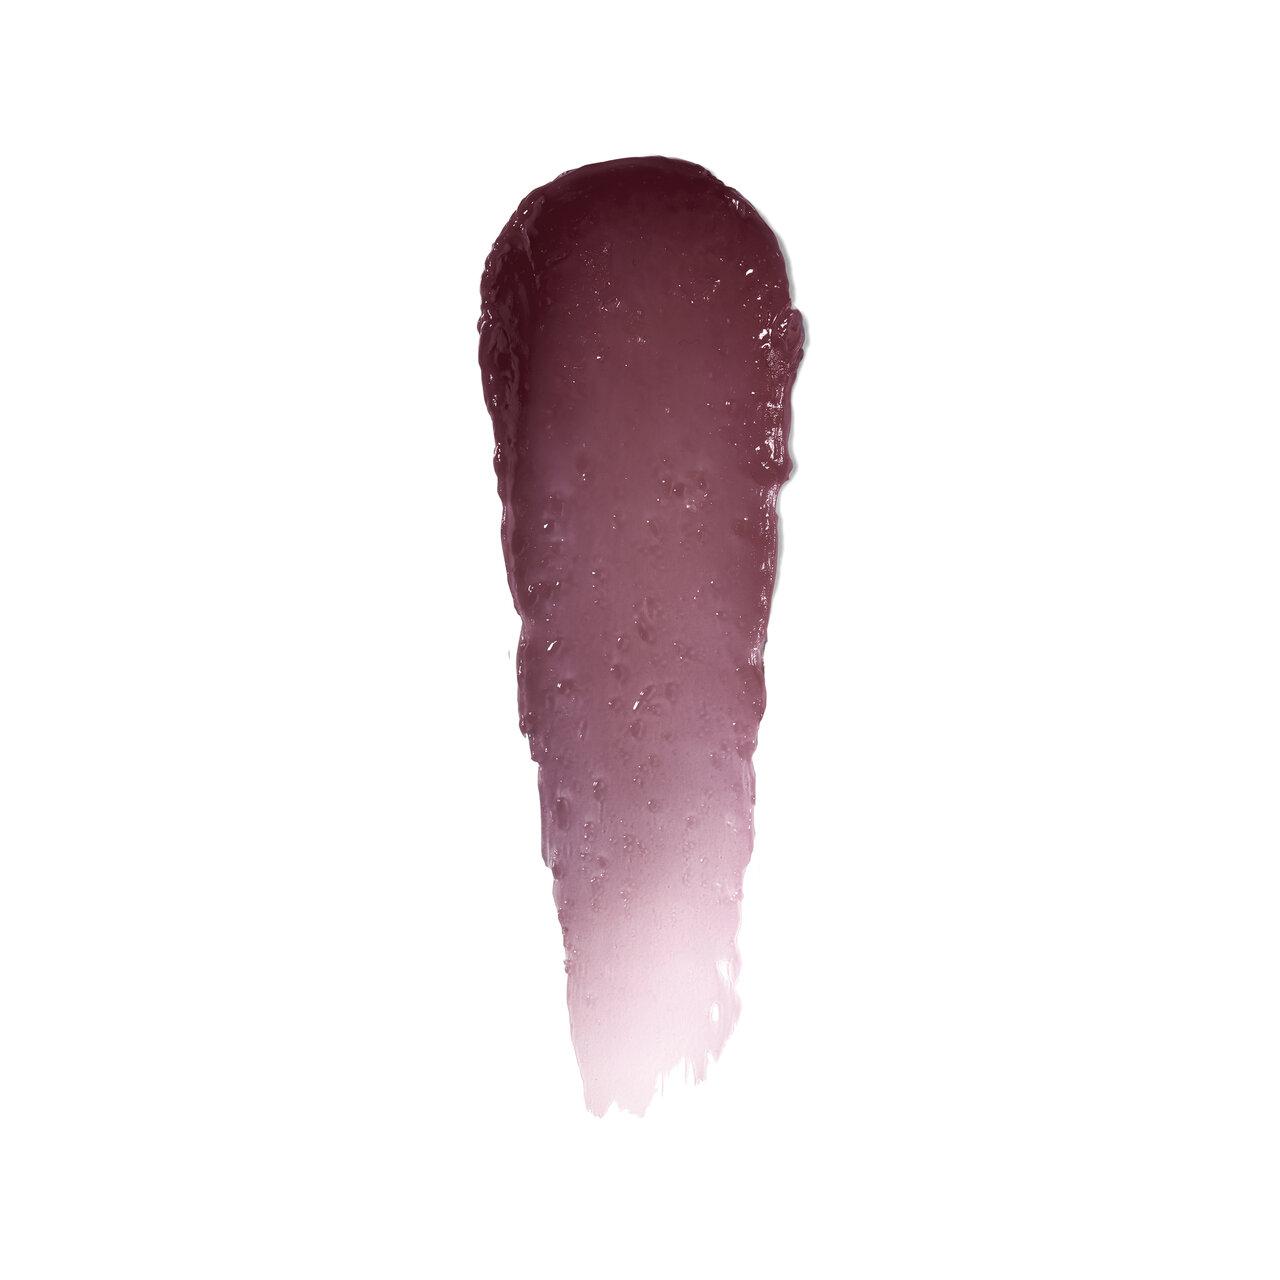 BOBBI BROWN(ボビイ ブラウン)2021新作コスメ/バレンタイン「エクストラ リップ ティント」